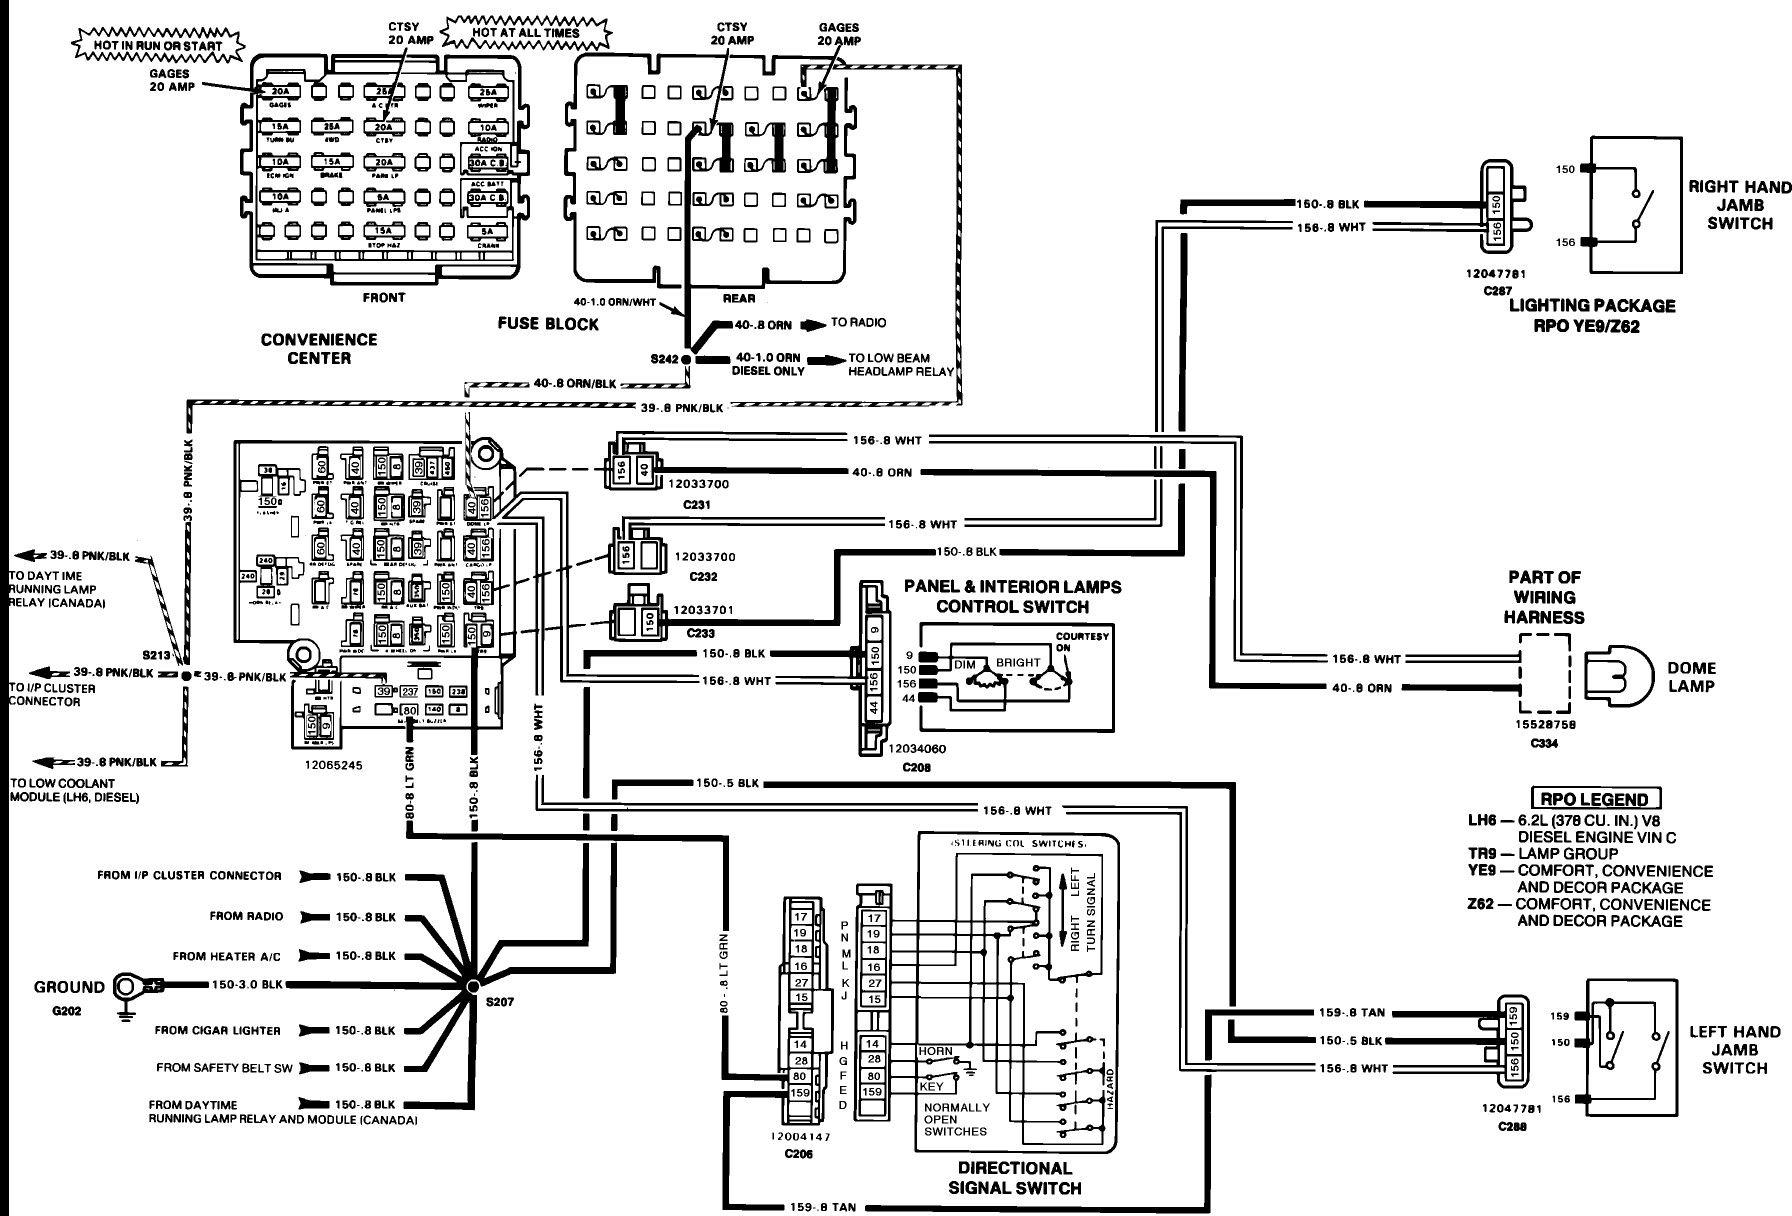 1993 Chevy Silverado Wiring Diagram Luxury 1993 Chevy